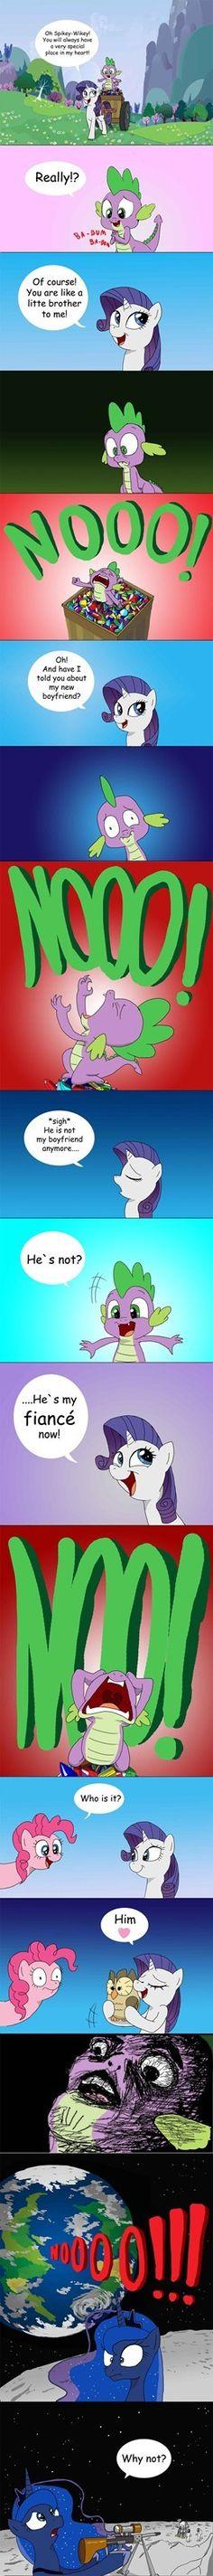 Spike's Worst Nightmare